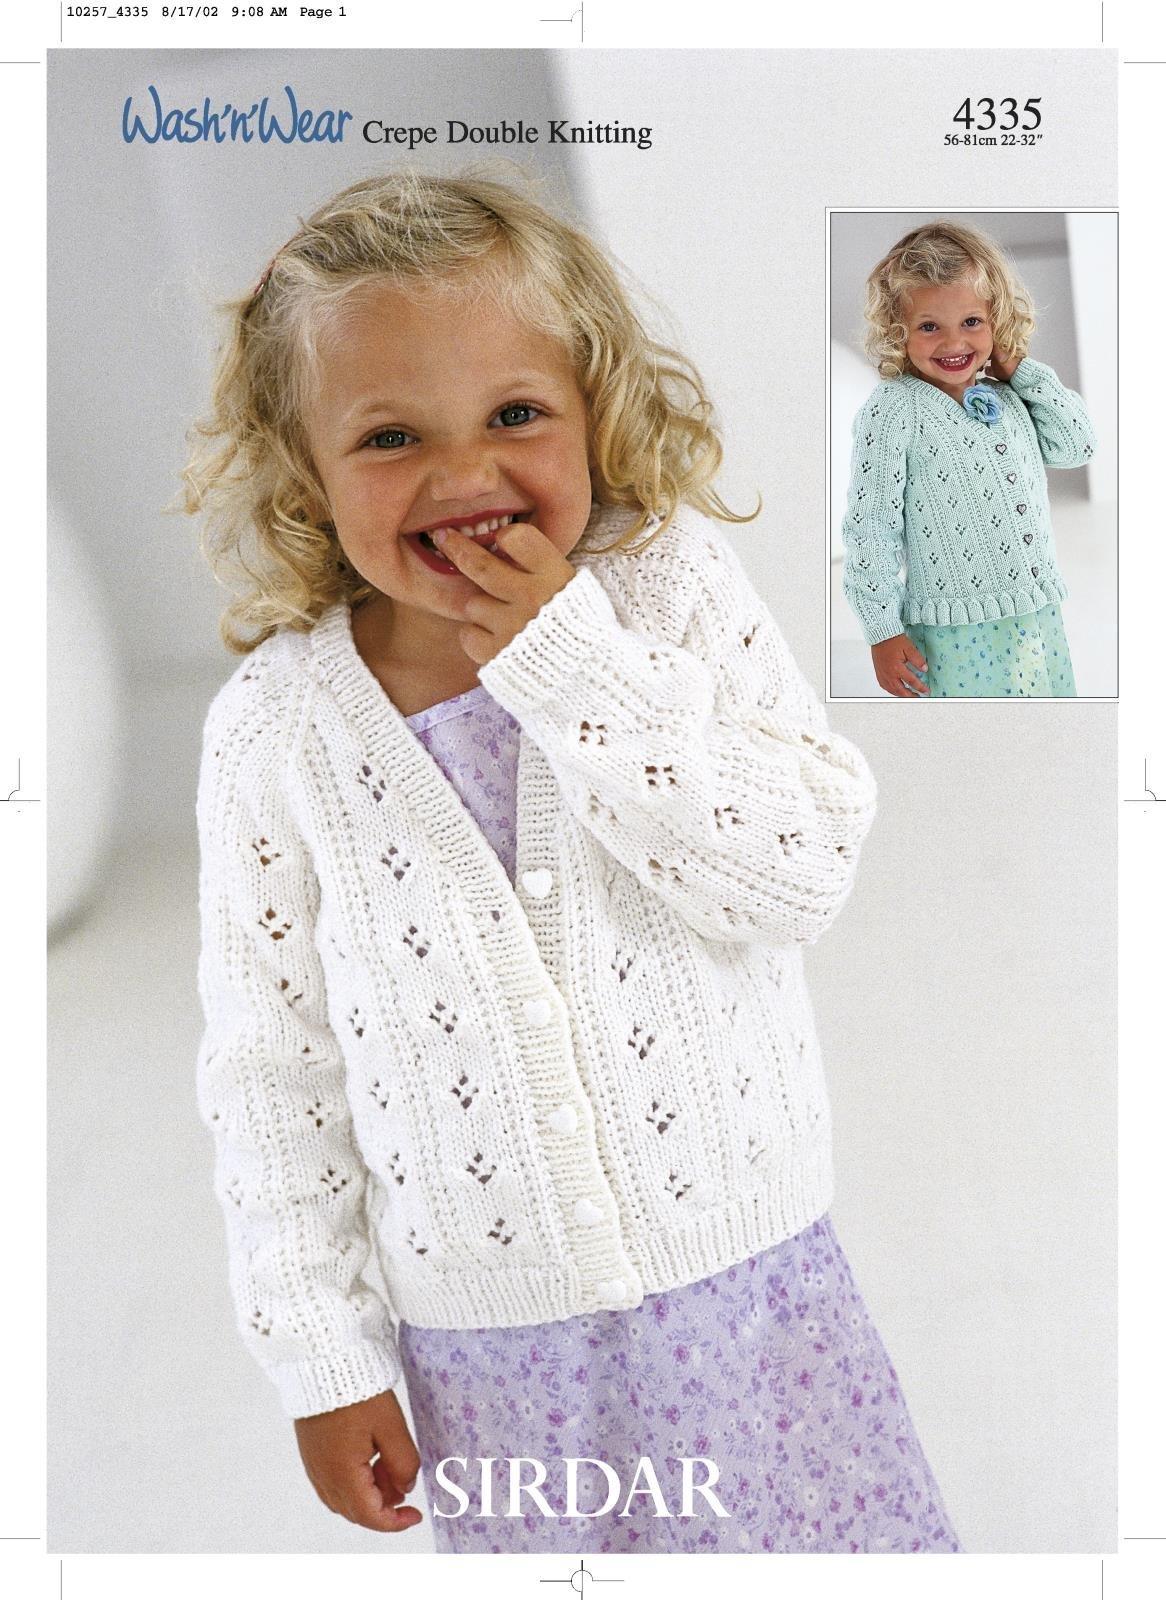 Knitting Patterns for Children: Amazon.co.uk